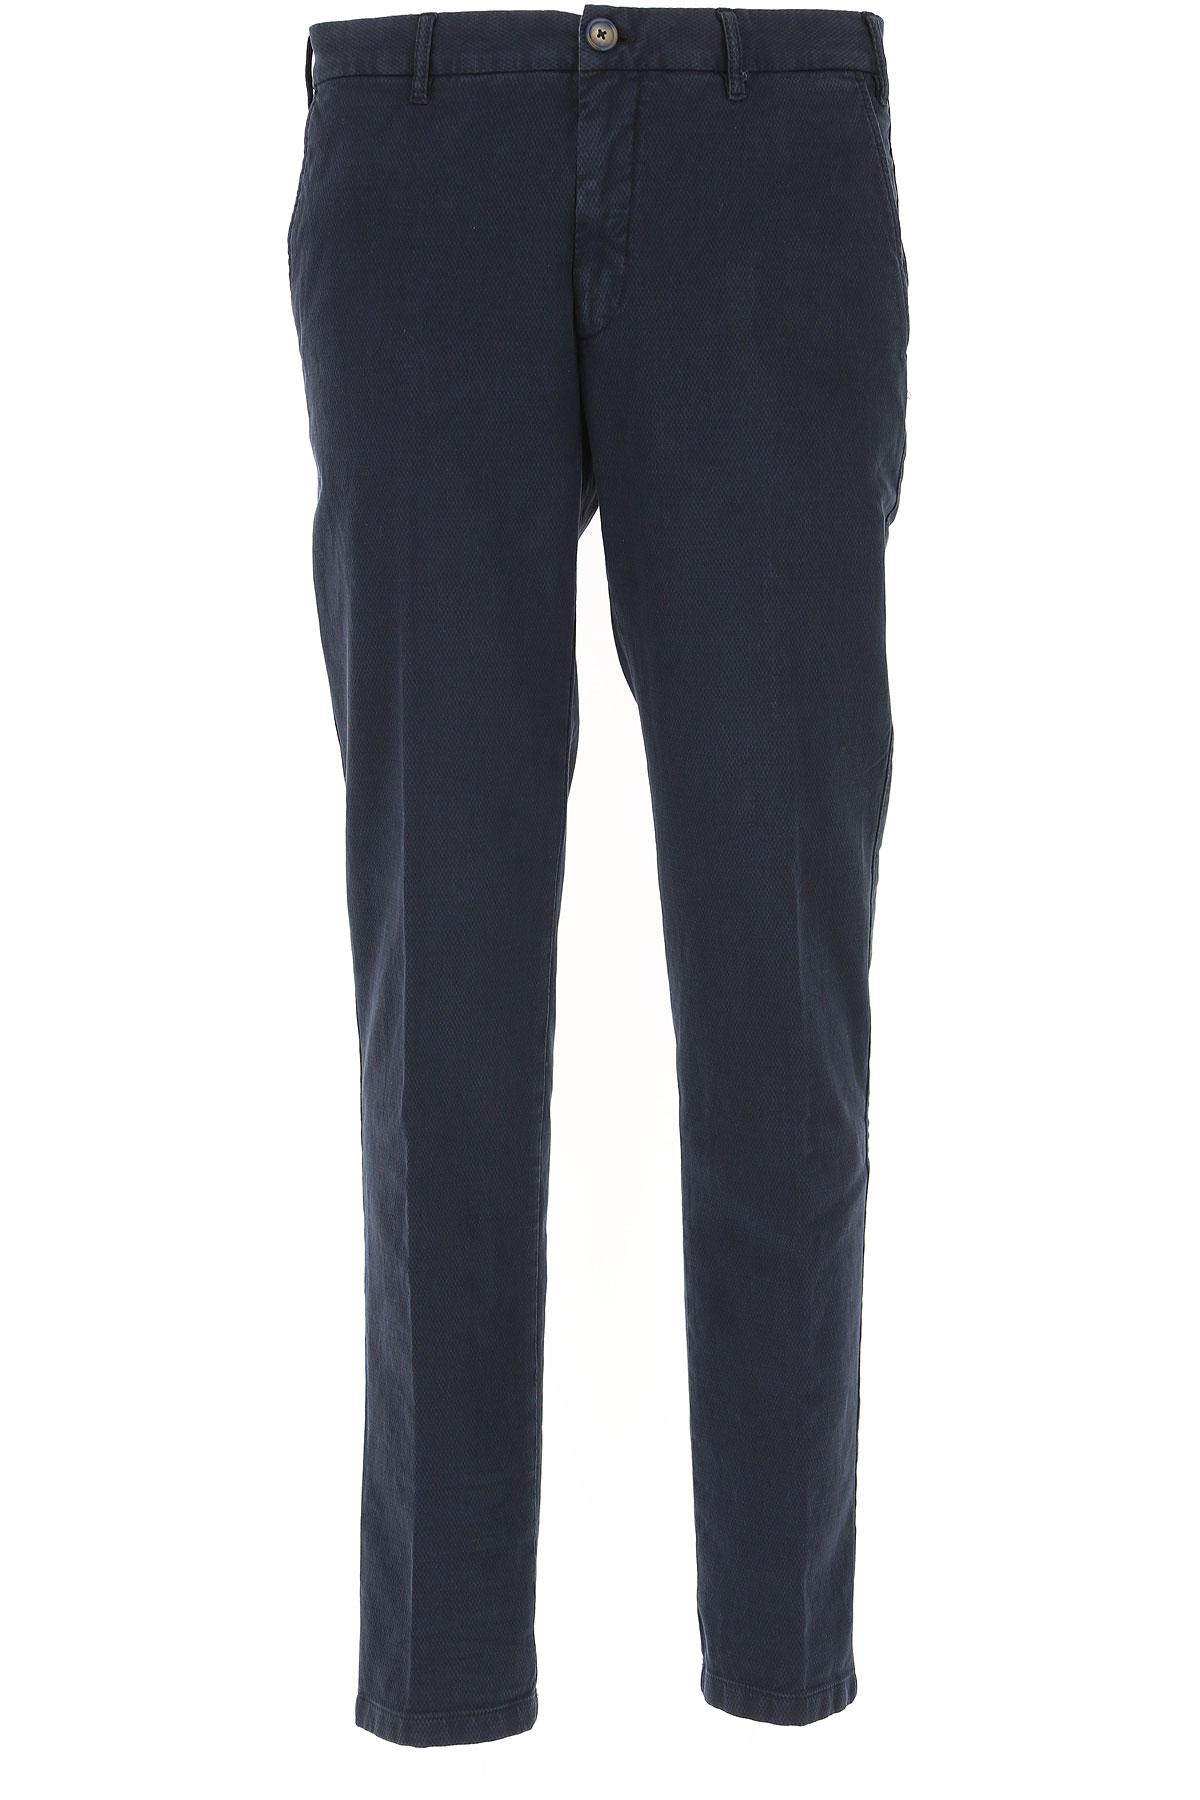 Image of J.W. Brine Pants for Men, navy, Cotton, 2017, 30 34 40